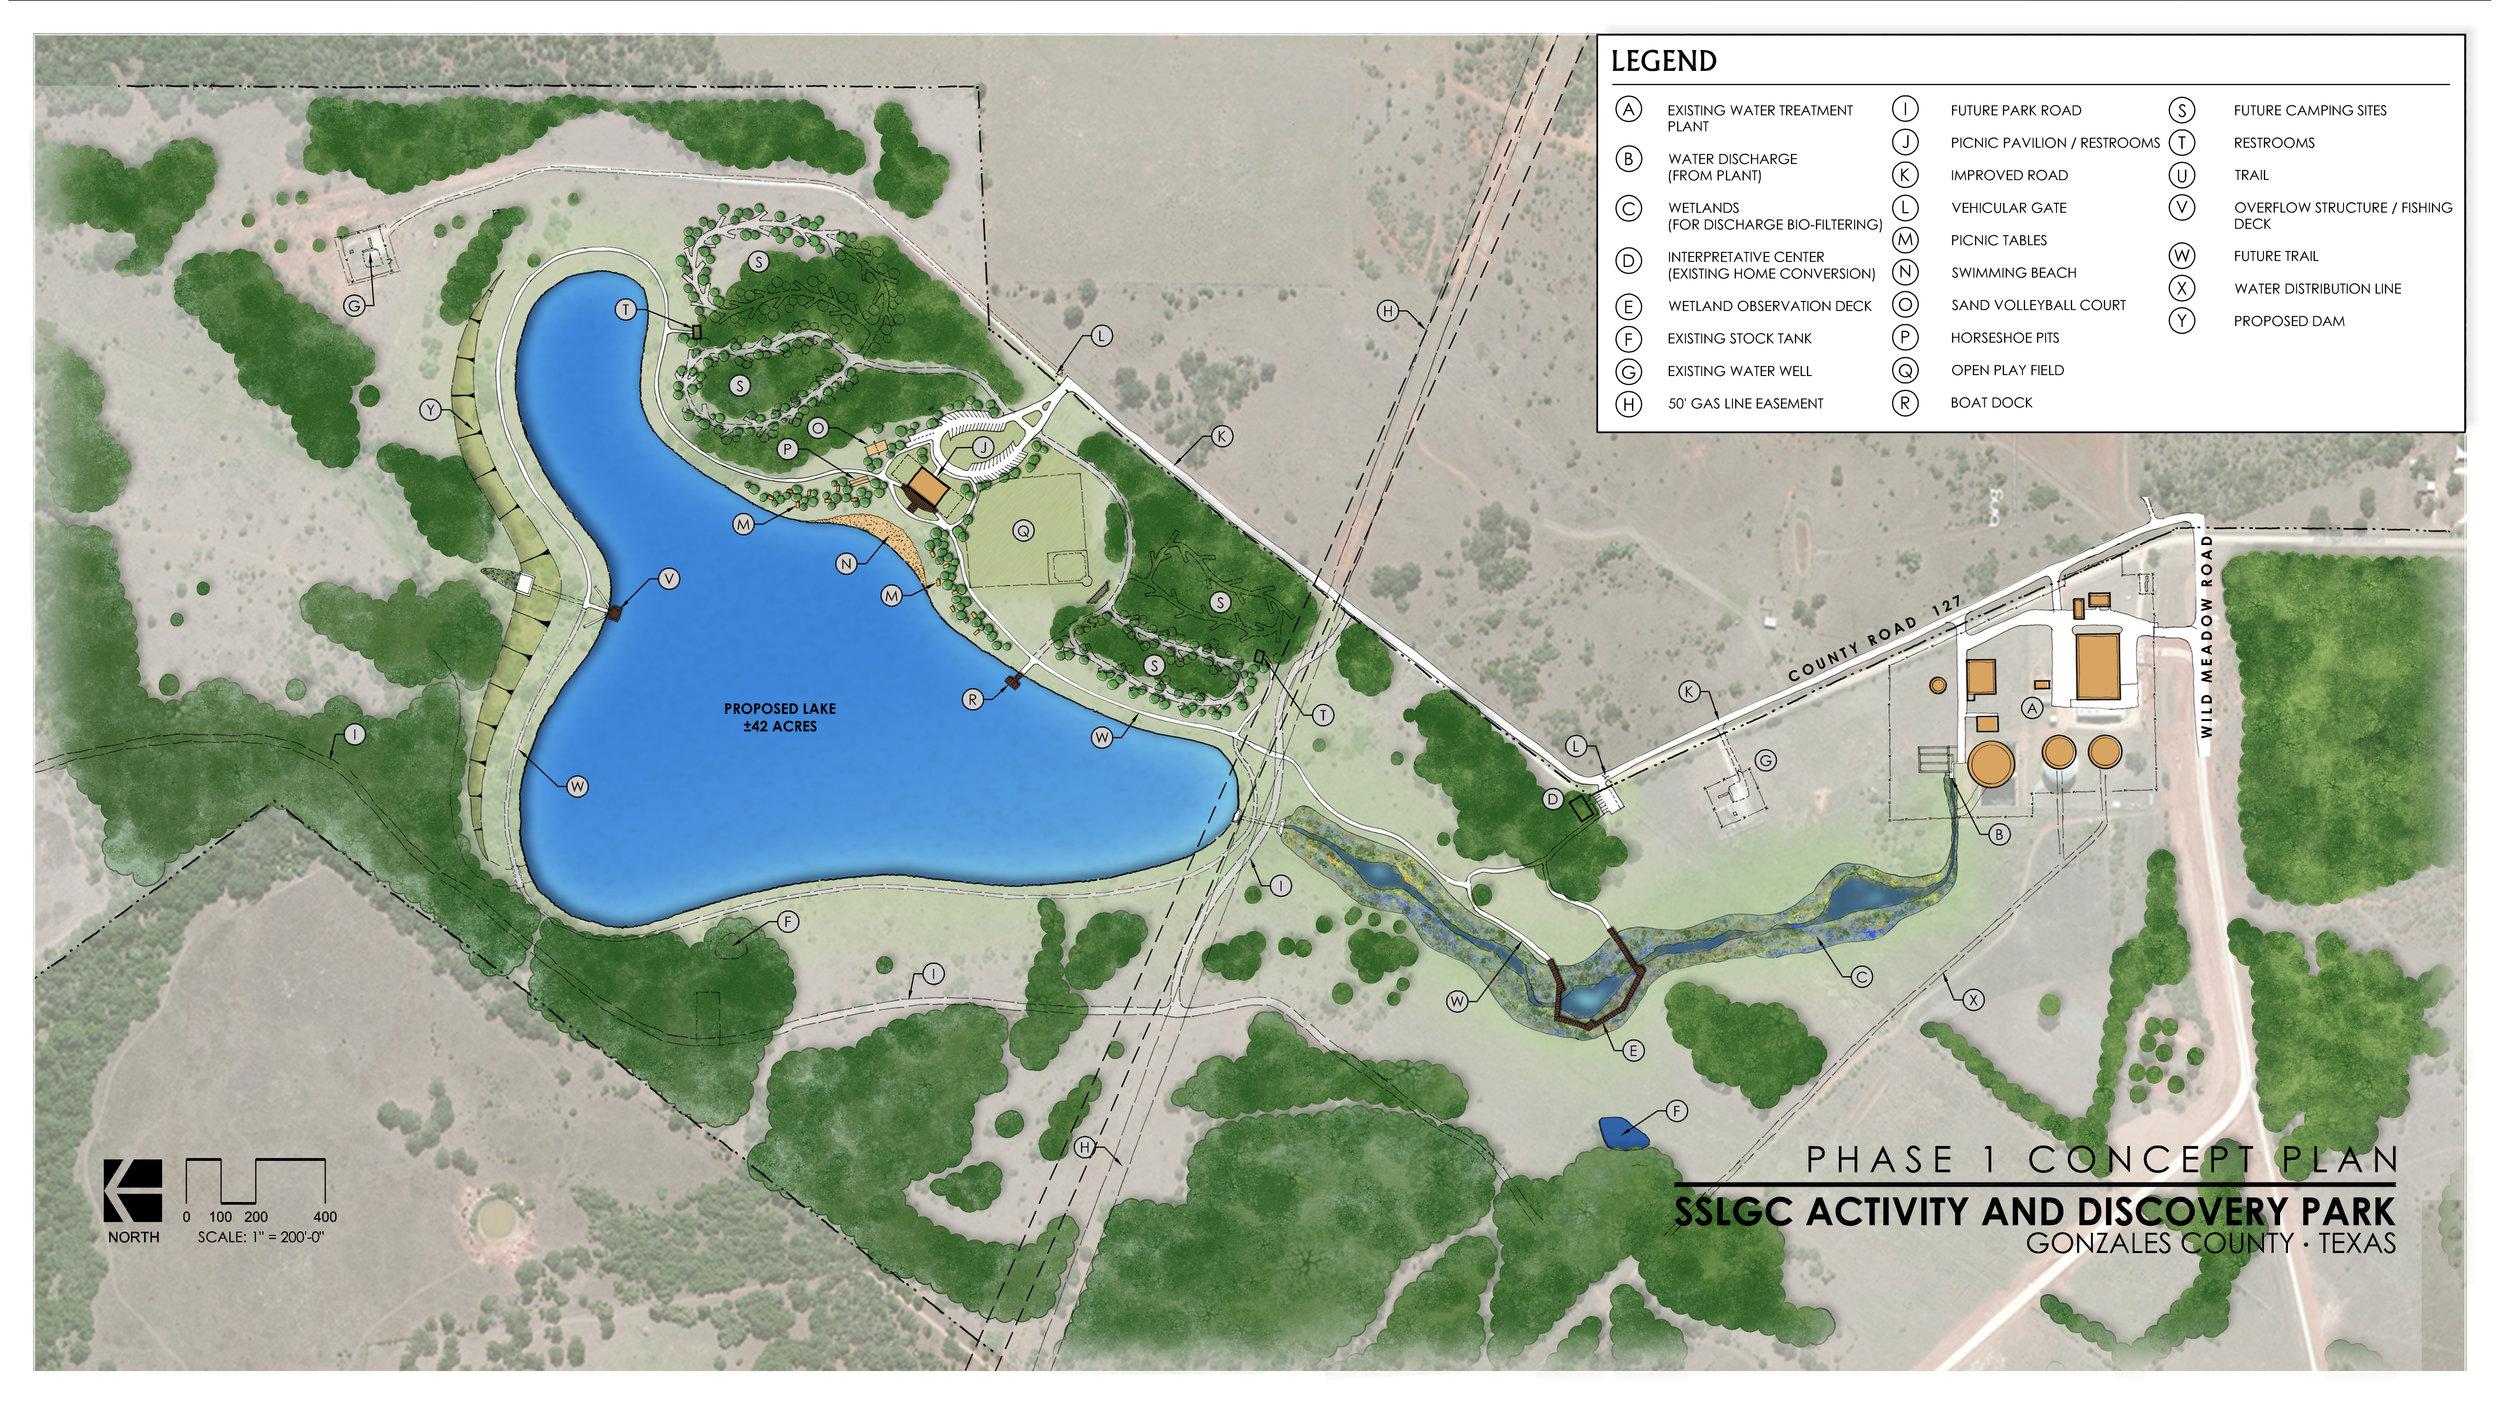 4-Phase 1 Concept Plan_Rendered.jpg